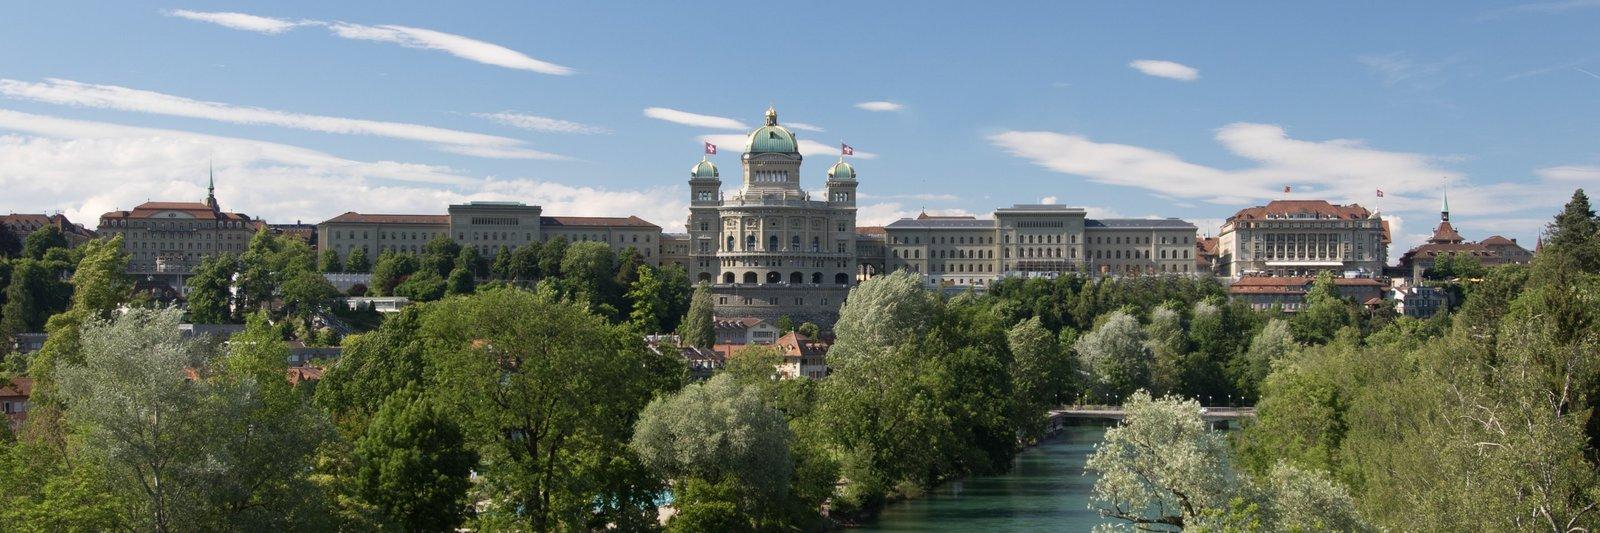 Raiffeisenbank Bern